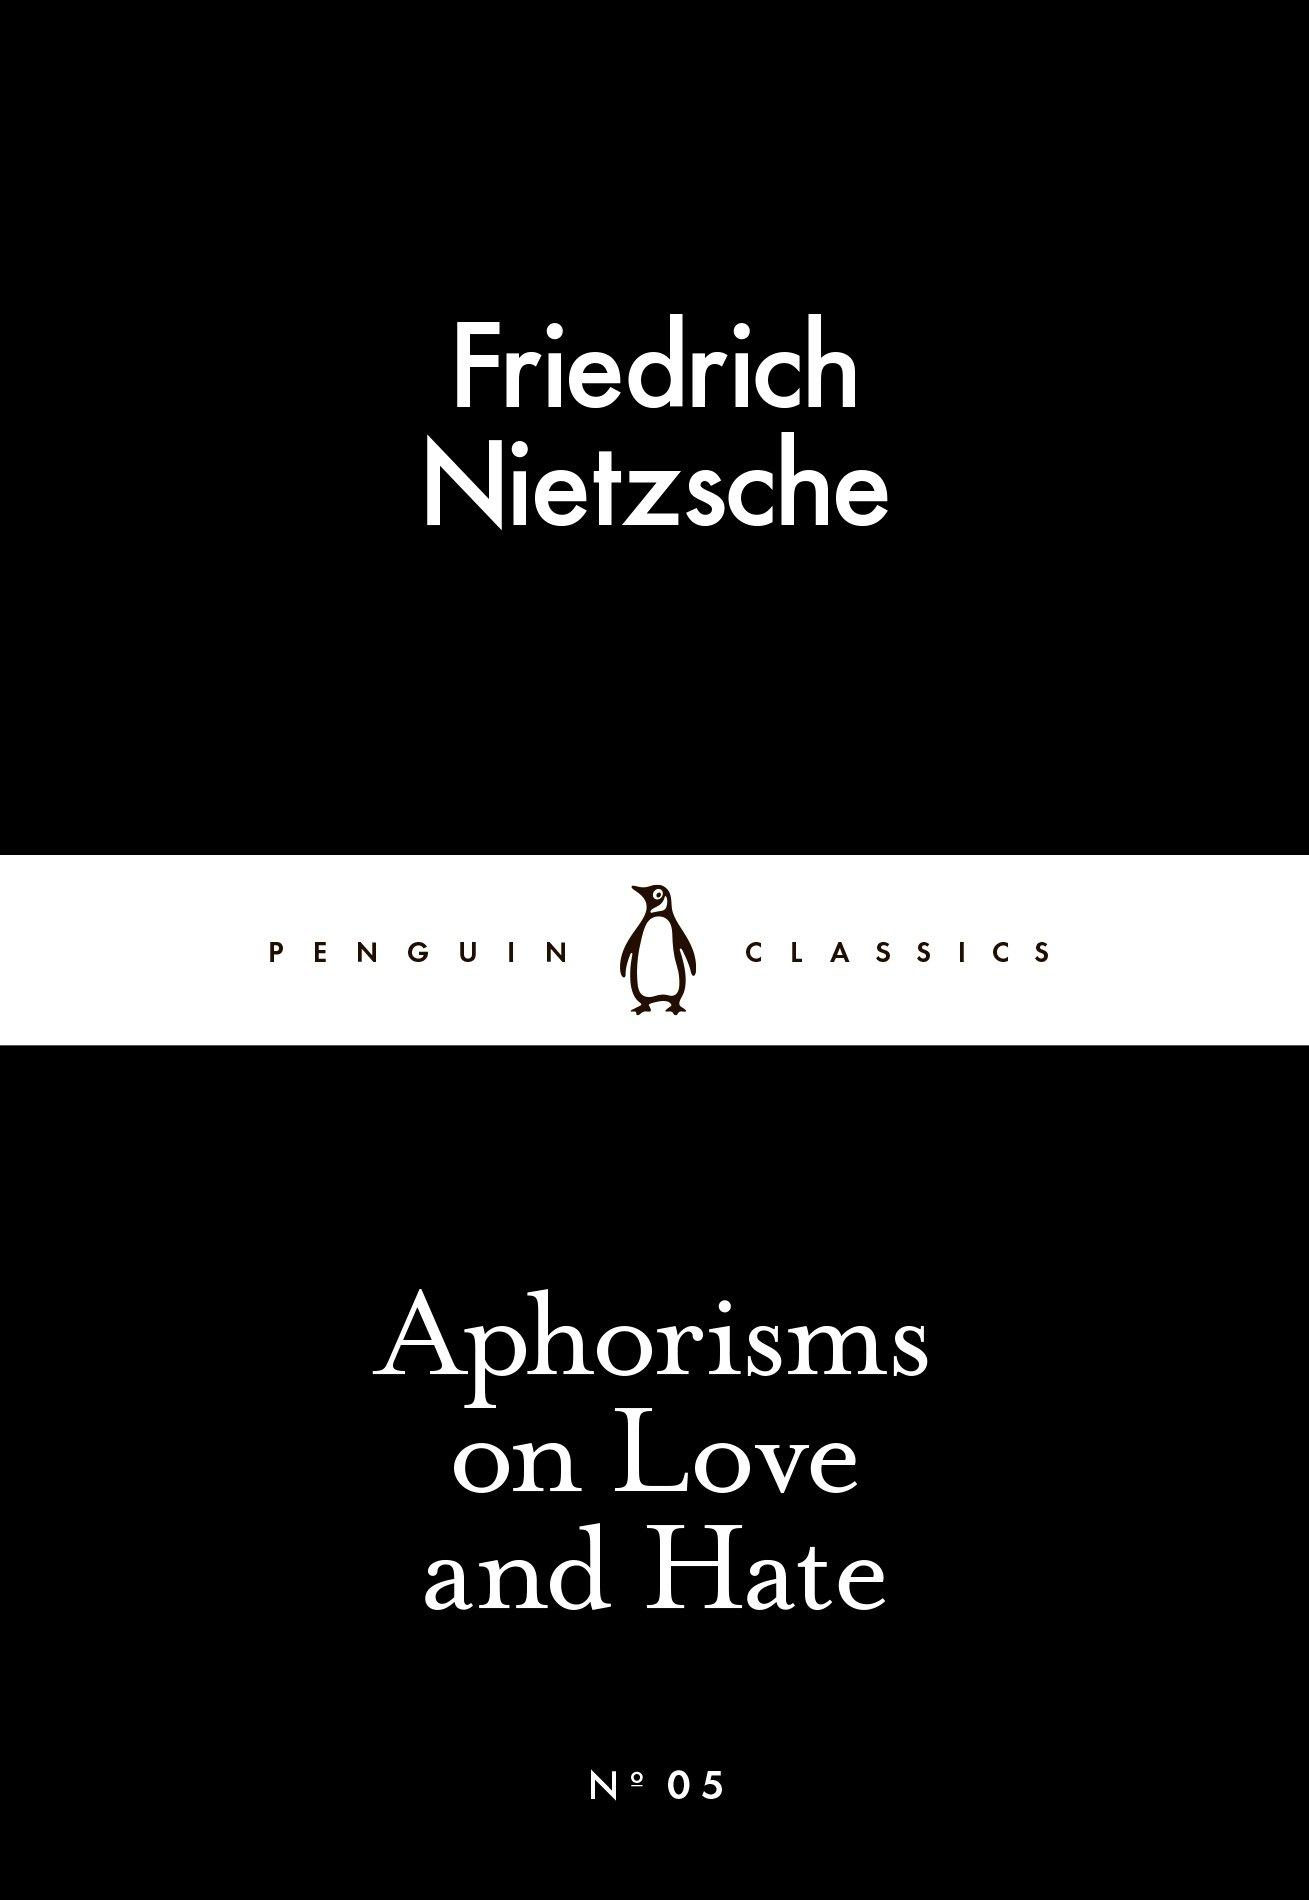 Aphorisms On Love And Hate Penguin Little Black Classics: Amazon.es: Nietzsche, Friedrich: Libros en idiomas extranjeros